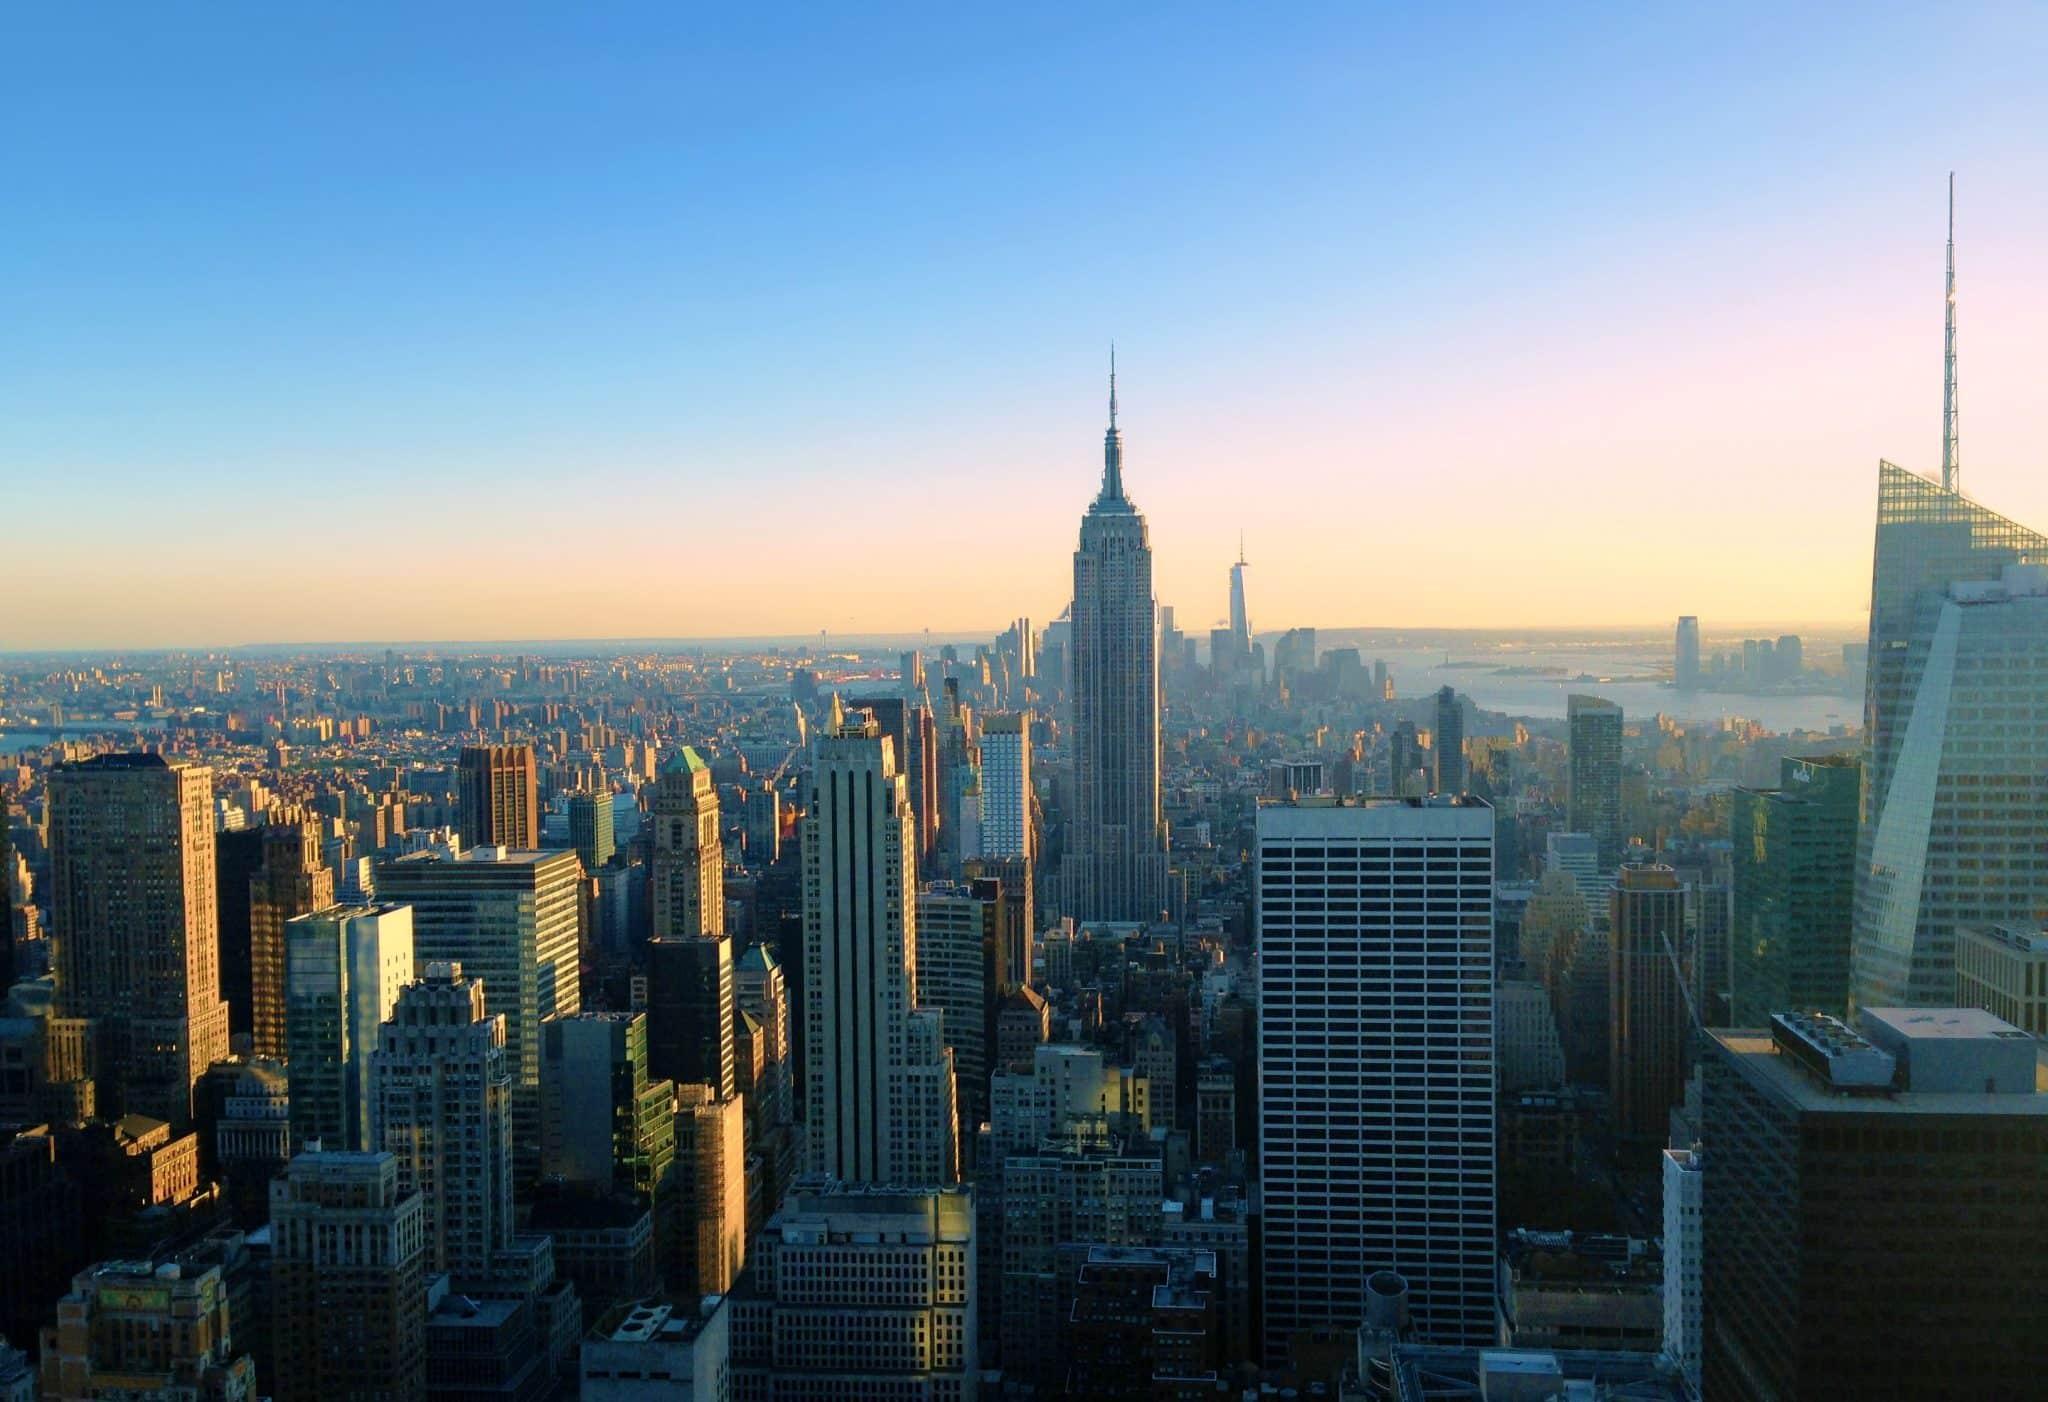 New York Cityscape: Empire State Vs. Top Of The Rock